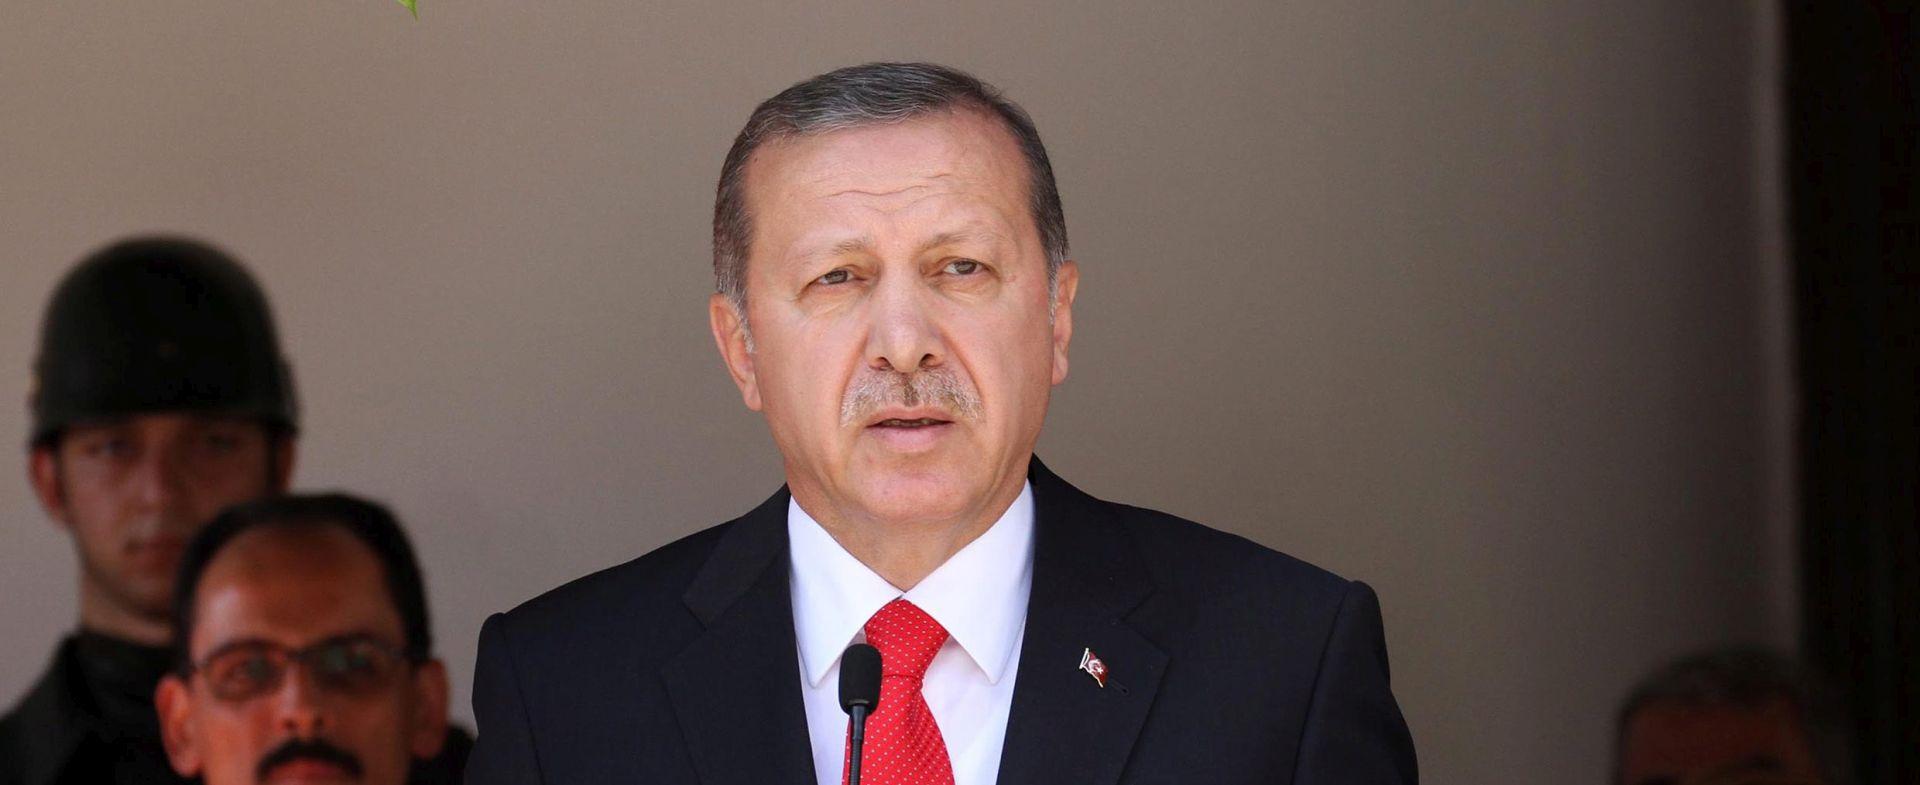 NARUŠENI ODNOSI: Sastanak Obame i Erdogana 4. rujna